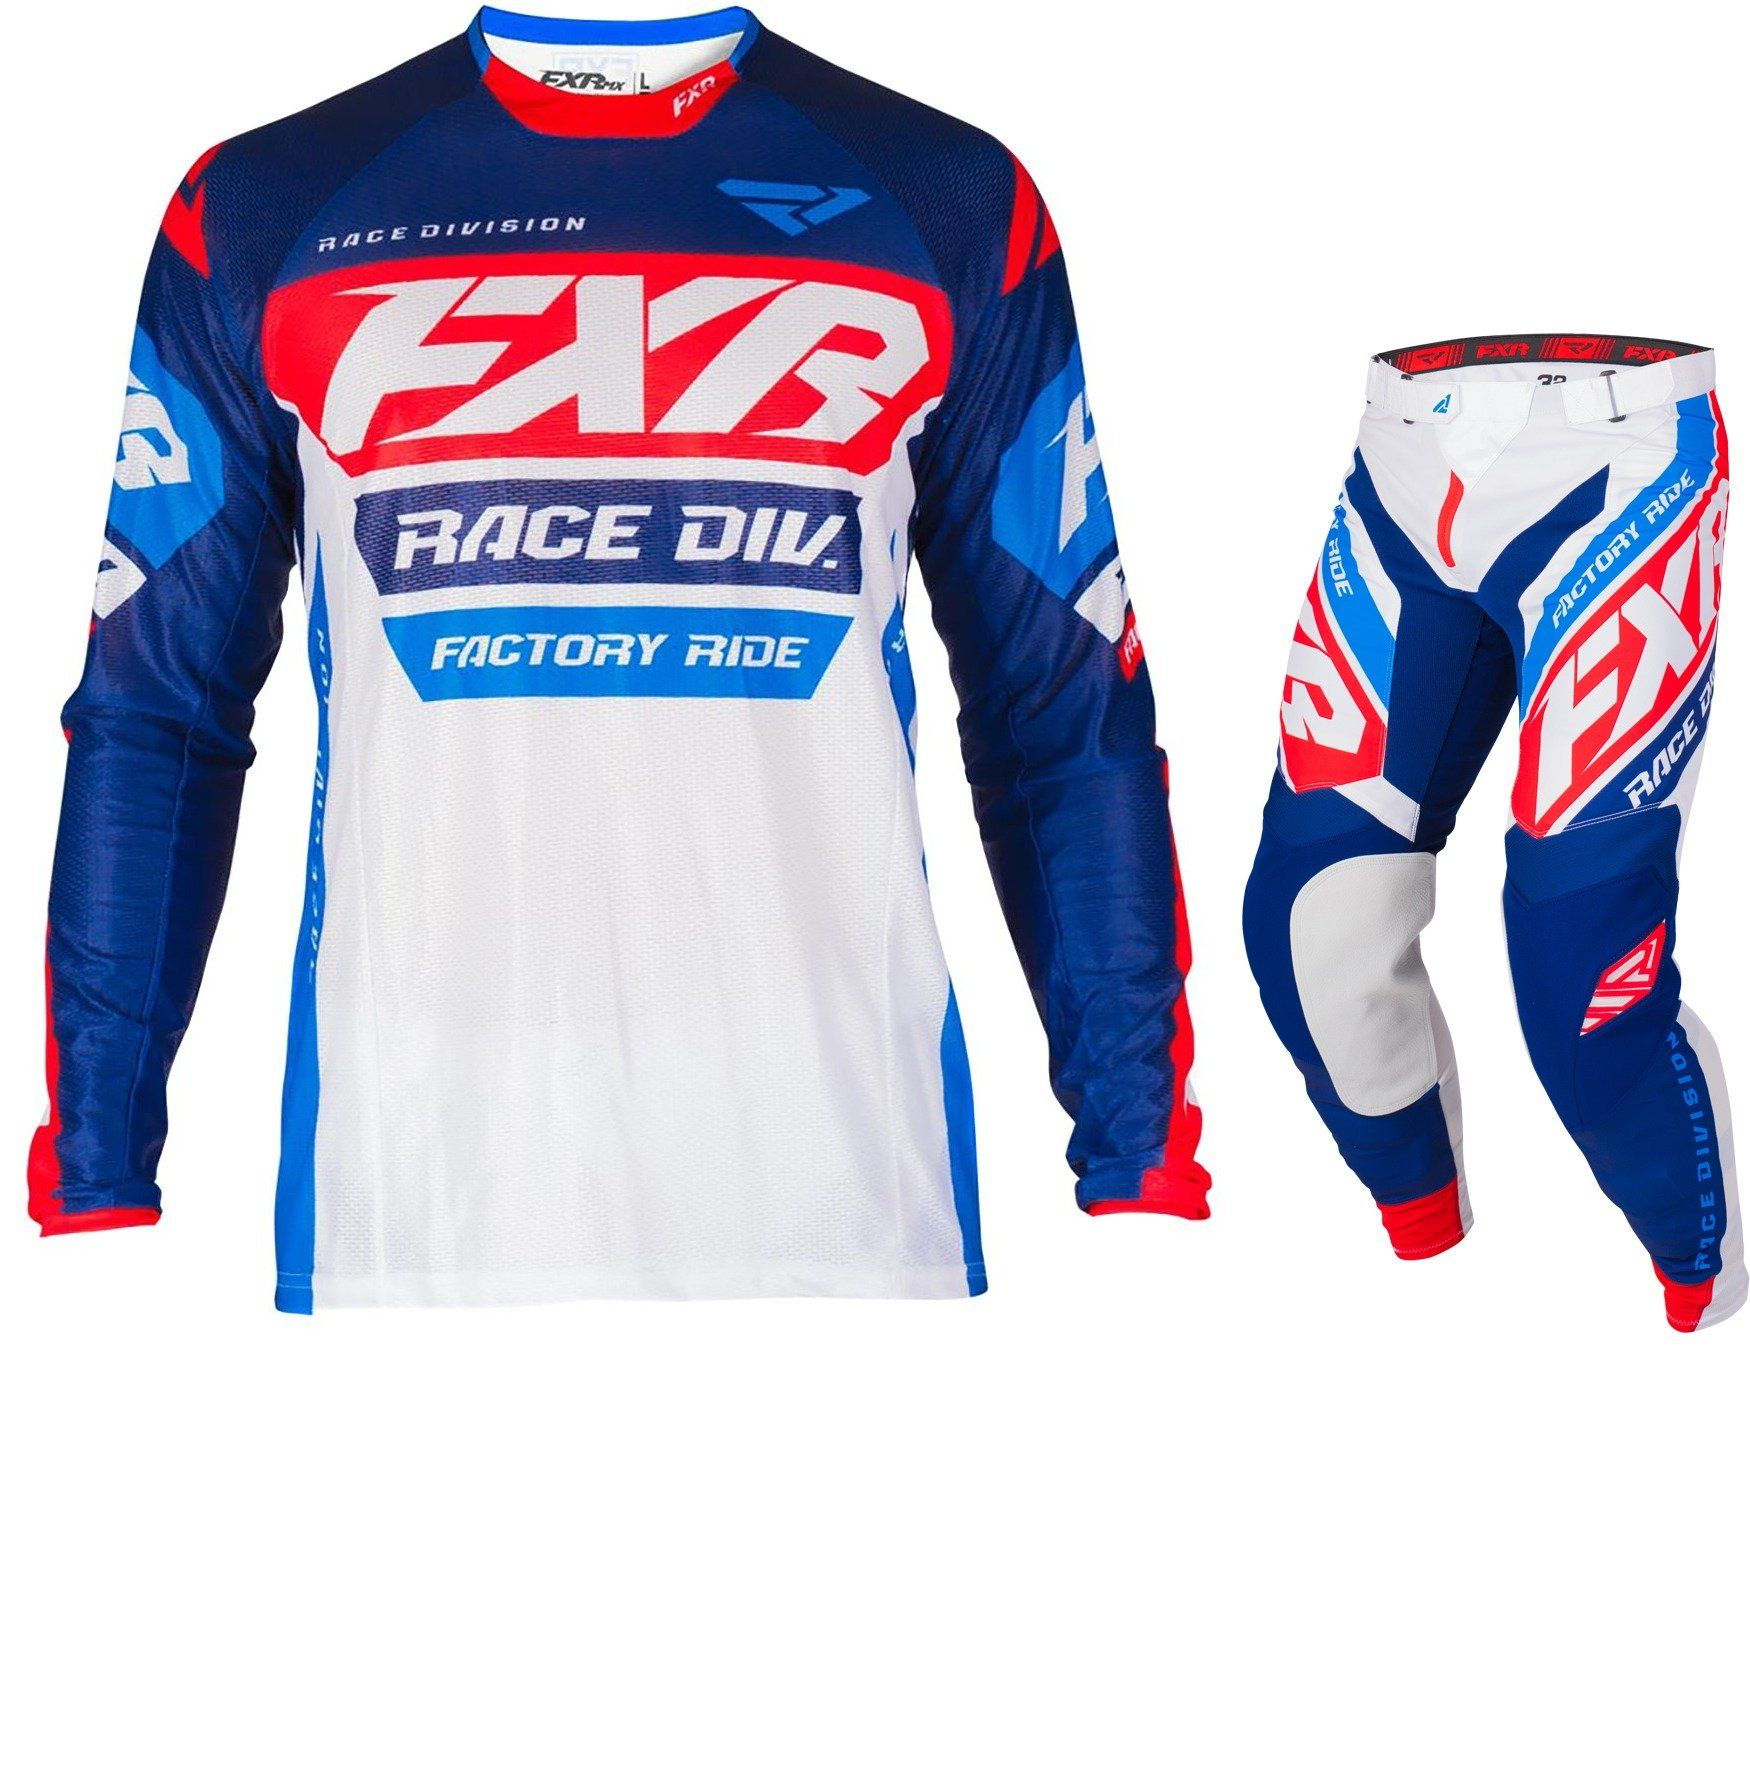 Download Buy Fxr Revo Kit Combo From Dirtbikebitz The Uk S Leading Motocross Retailer Free Uk Delivery Biking Outfit Motocross Kit Motocross